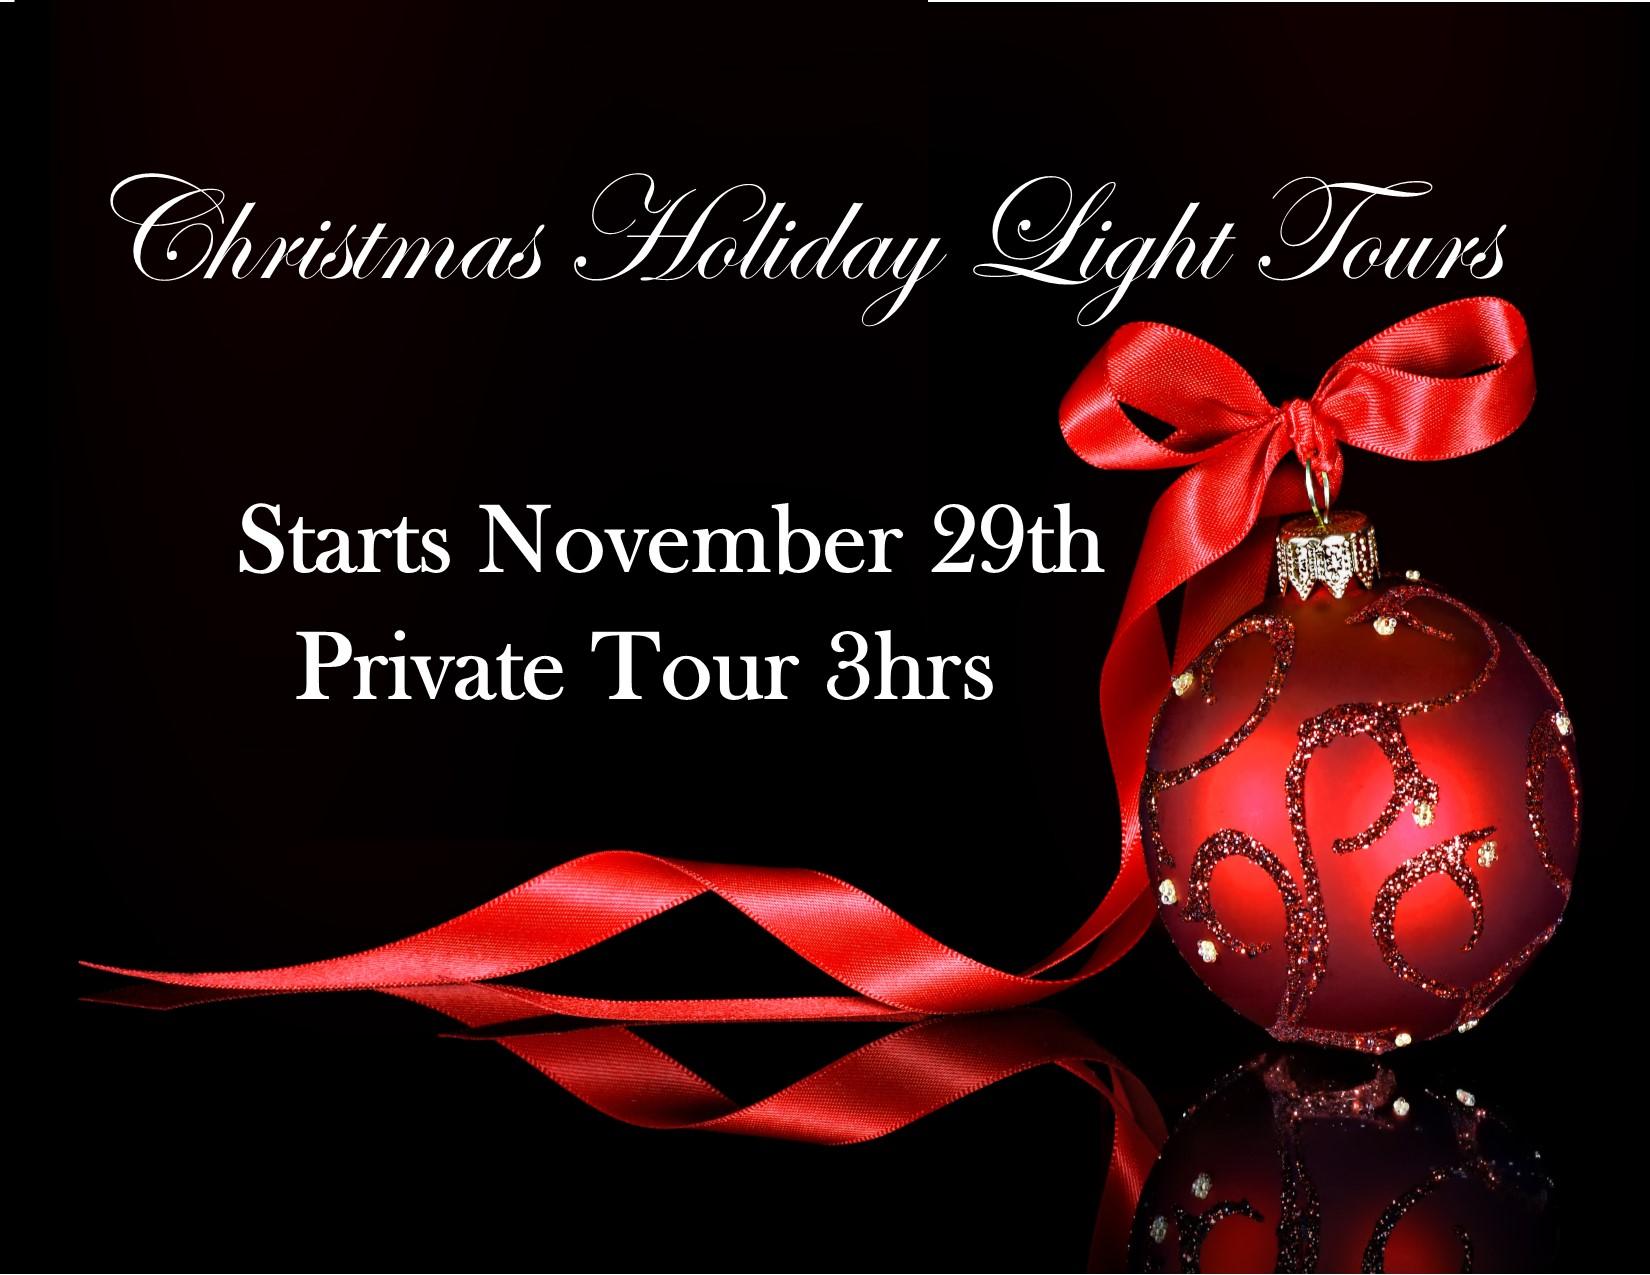 Phoenix AZ Scottsdale AZ Christmas Holid